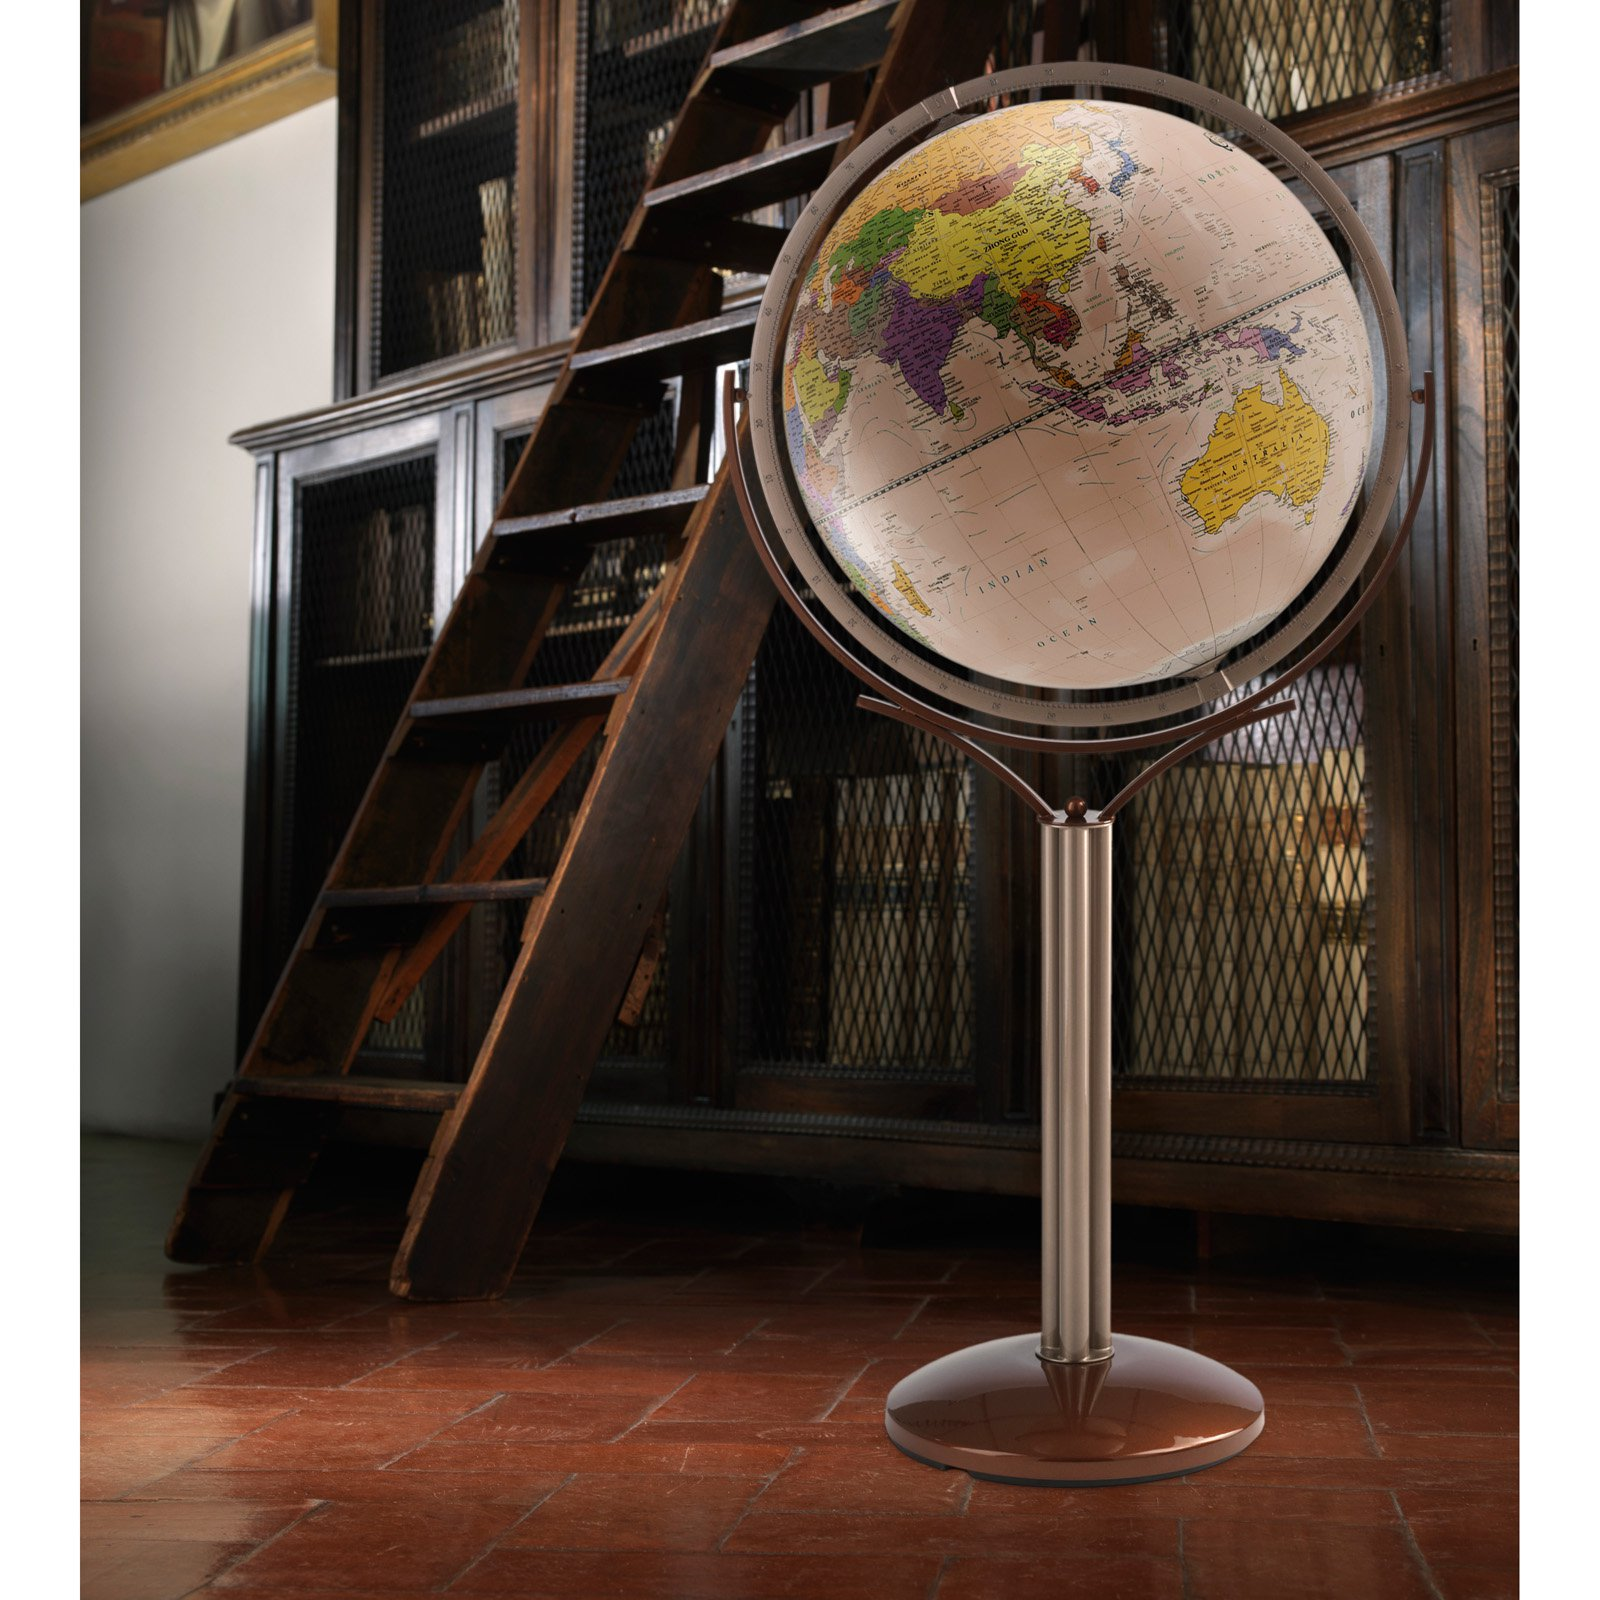 Zoffoli Magellano 24-in. Antique Ocean Floor Globe by